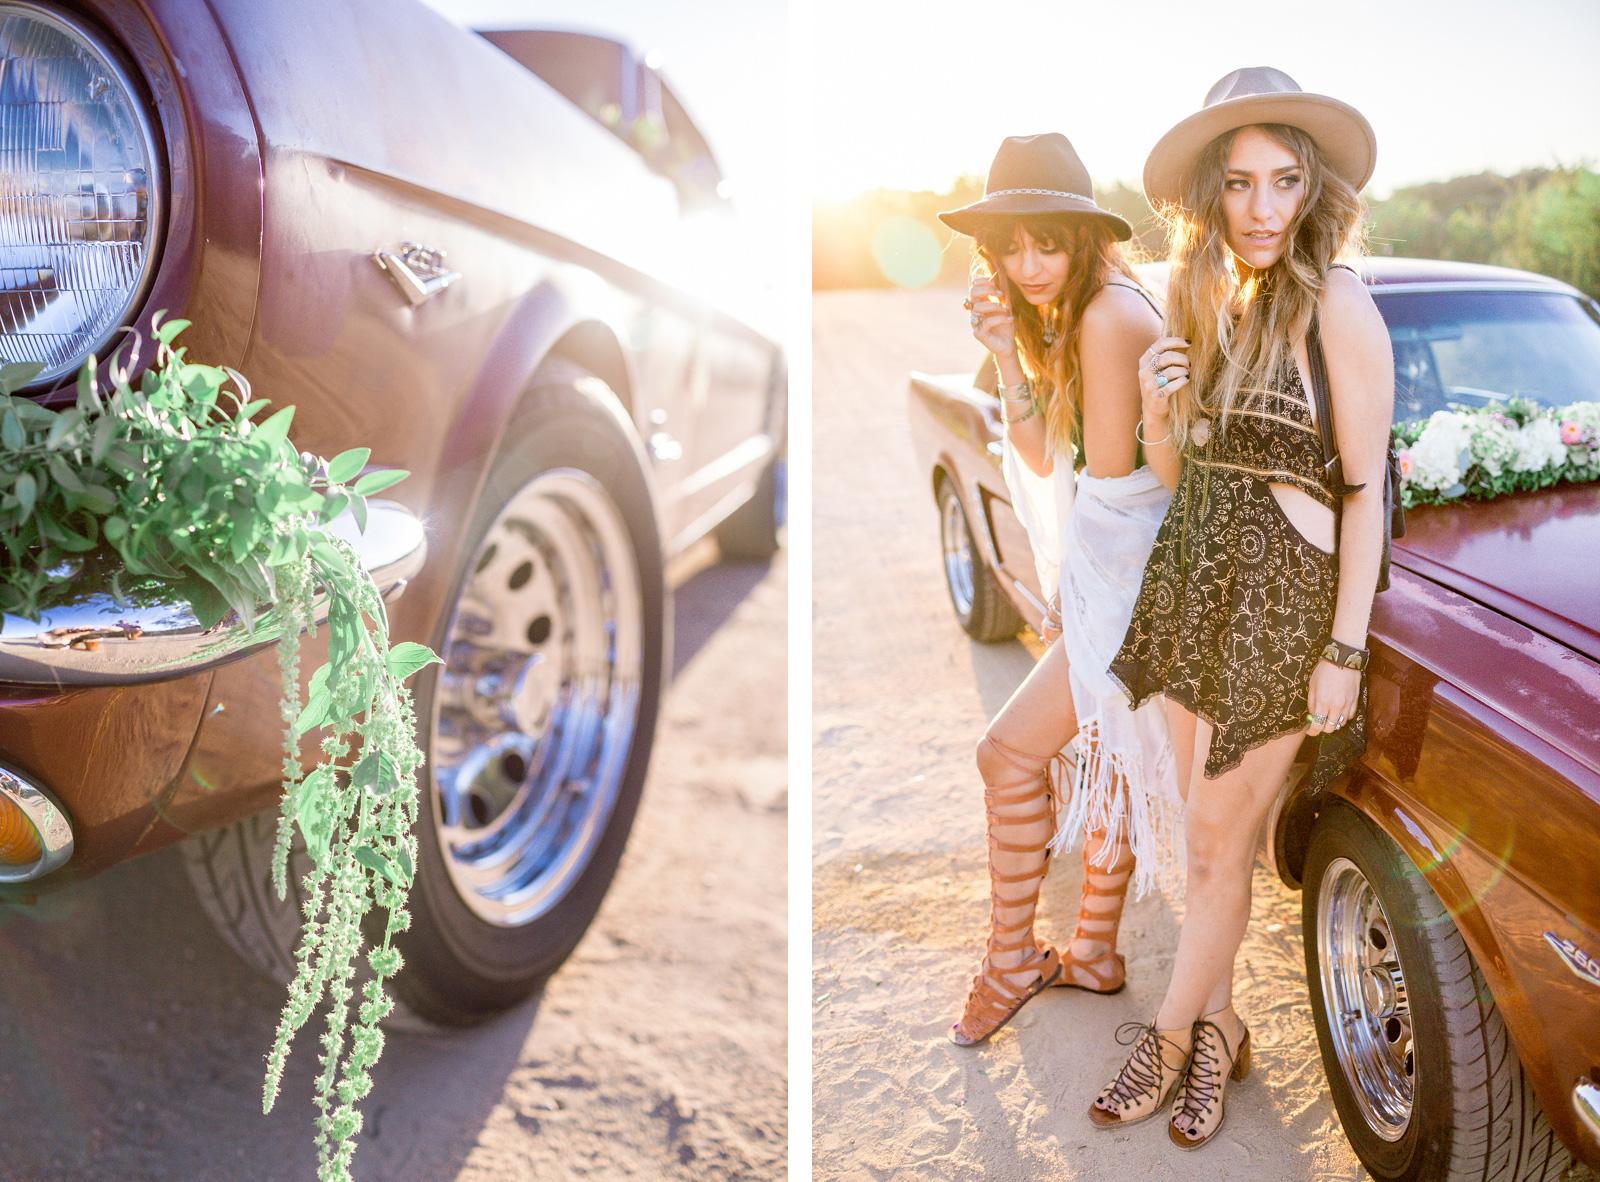 Festival-Stagecoach-Inspiration-Velvet-Sugar-Decorated-Mustang_05.jpg